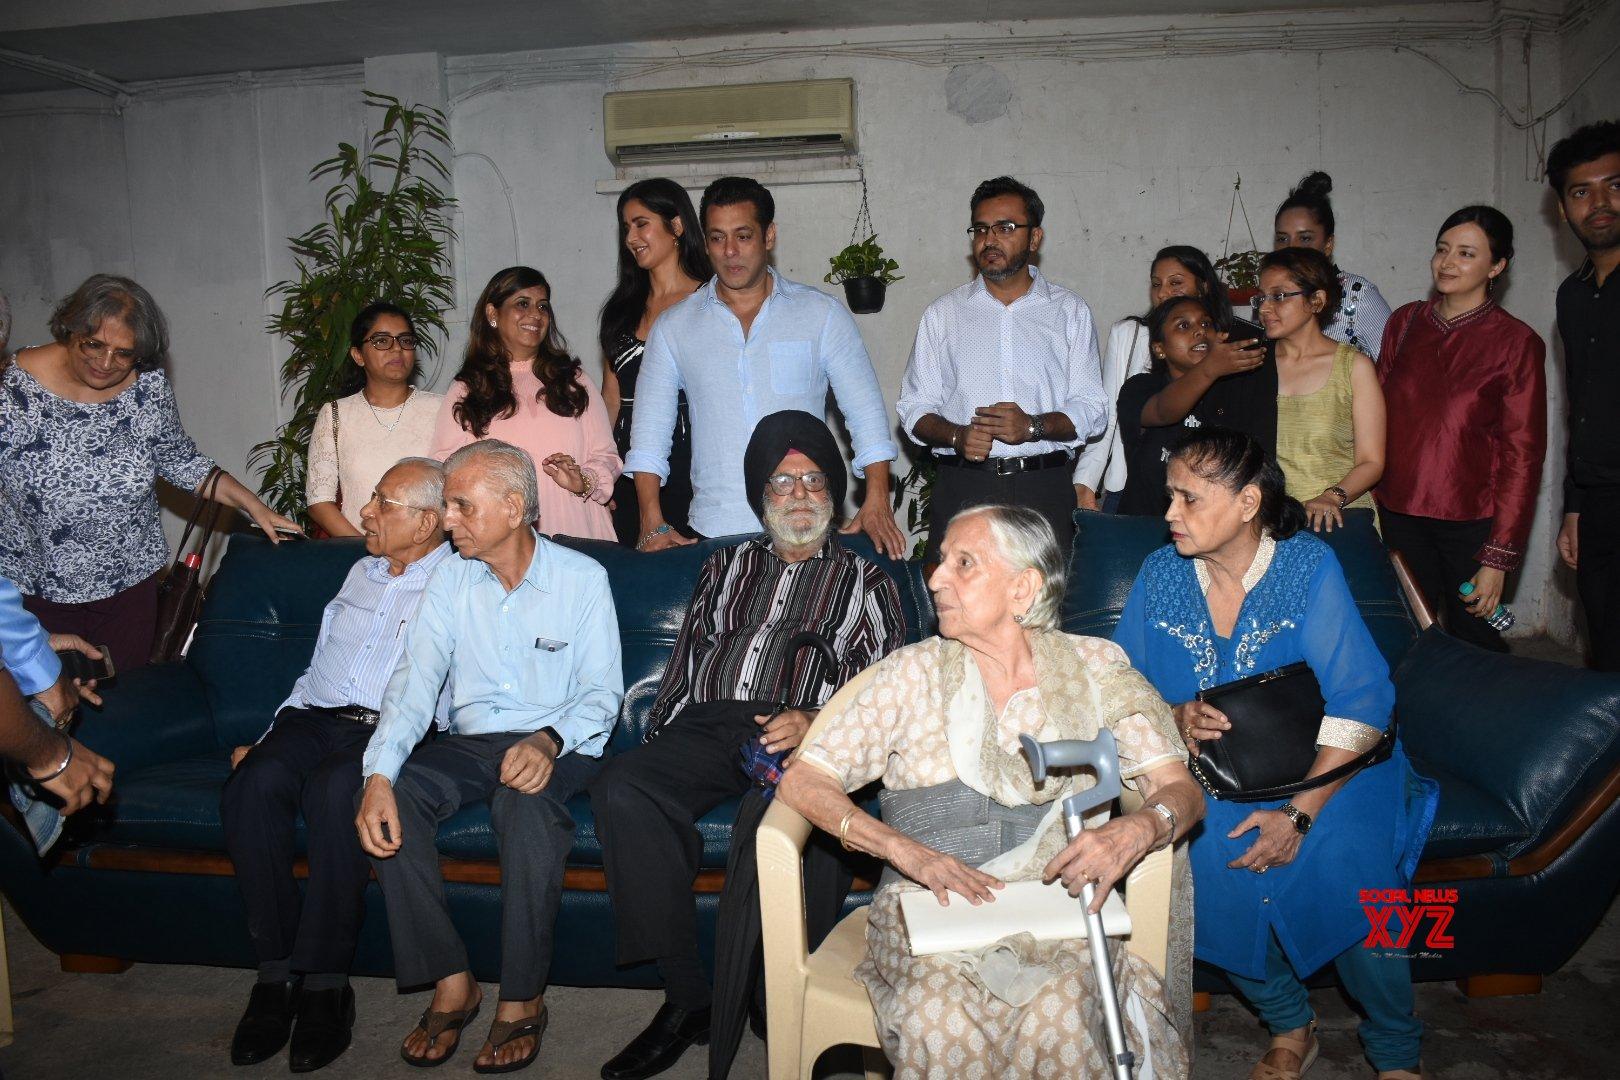 Mumbai: 'Bharat' special screening hosted for partition families - Salman Khan, Katrina Kaif #Gallery